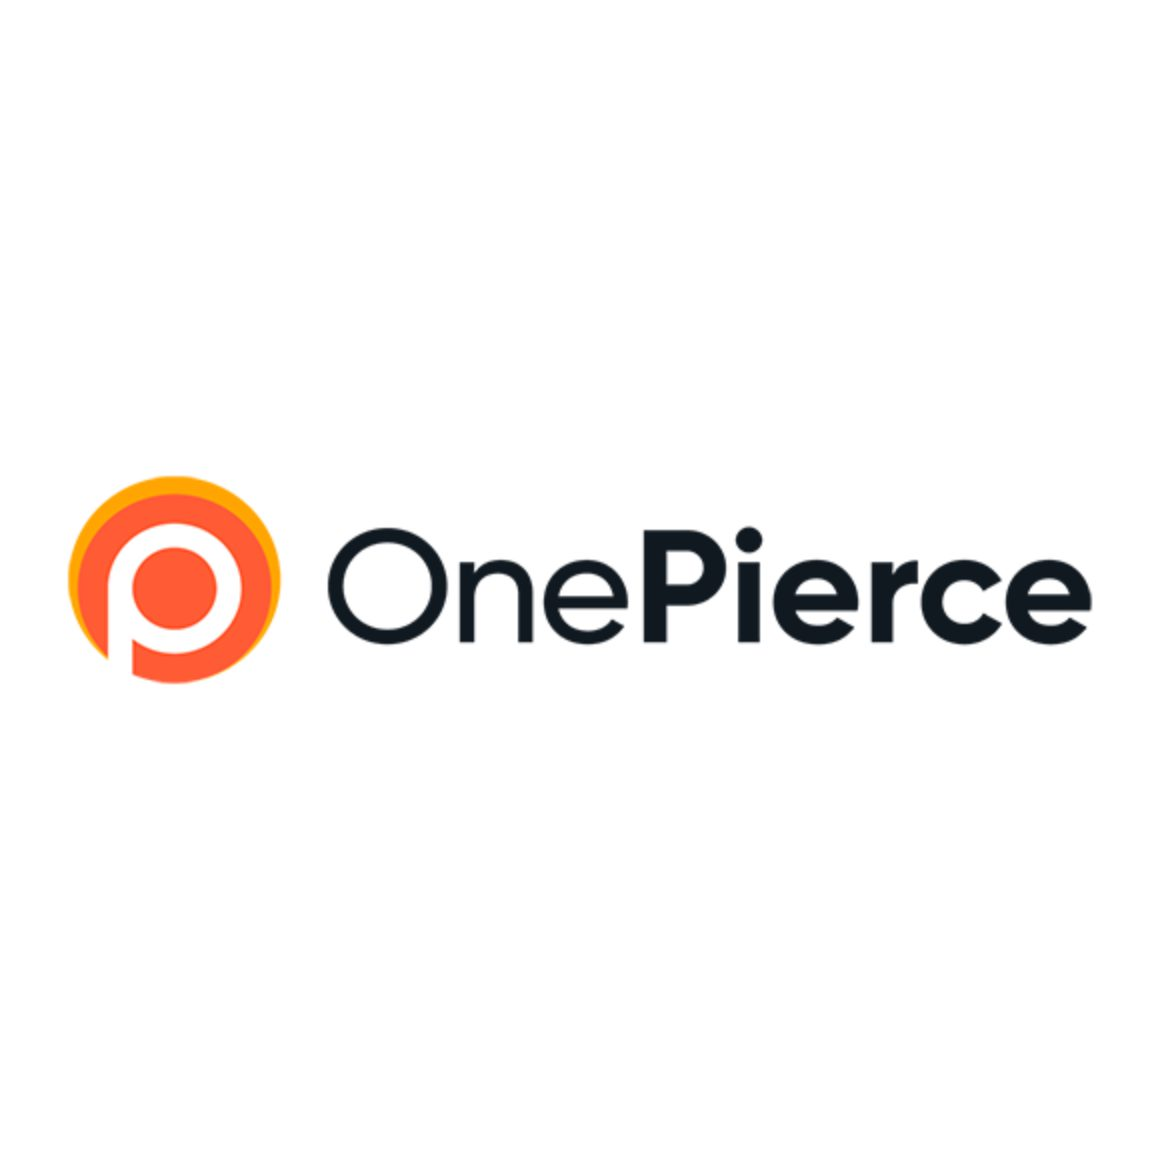 One Pierce logo